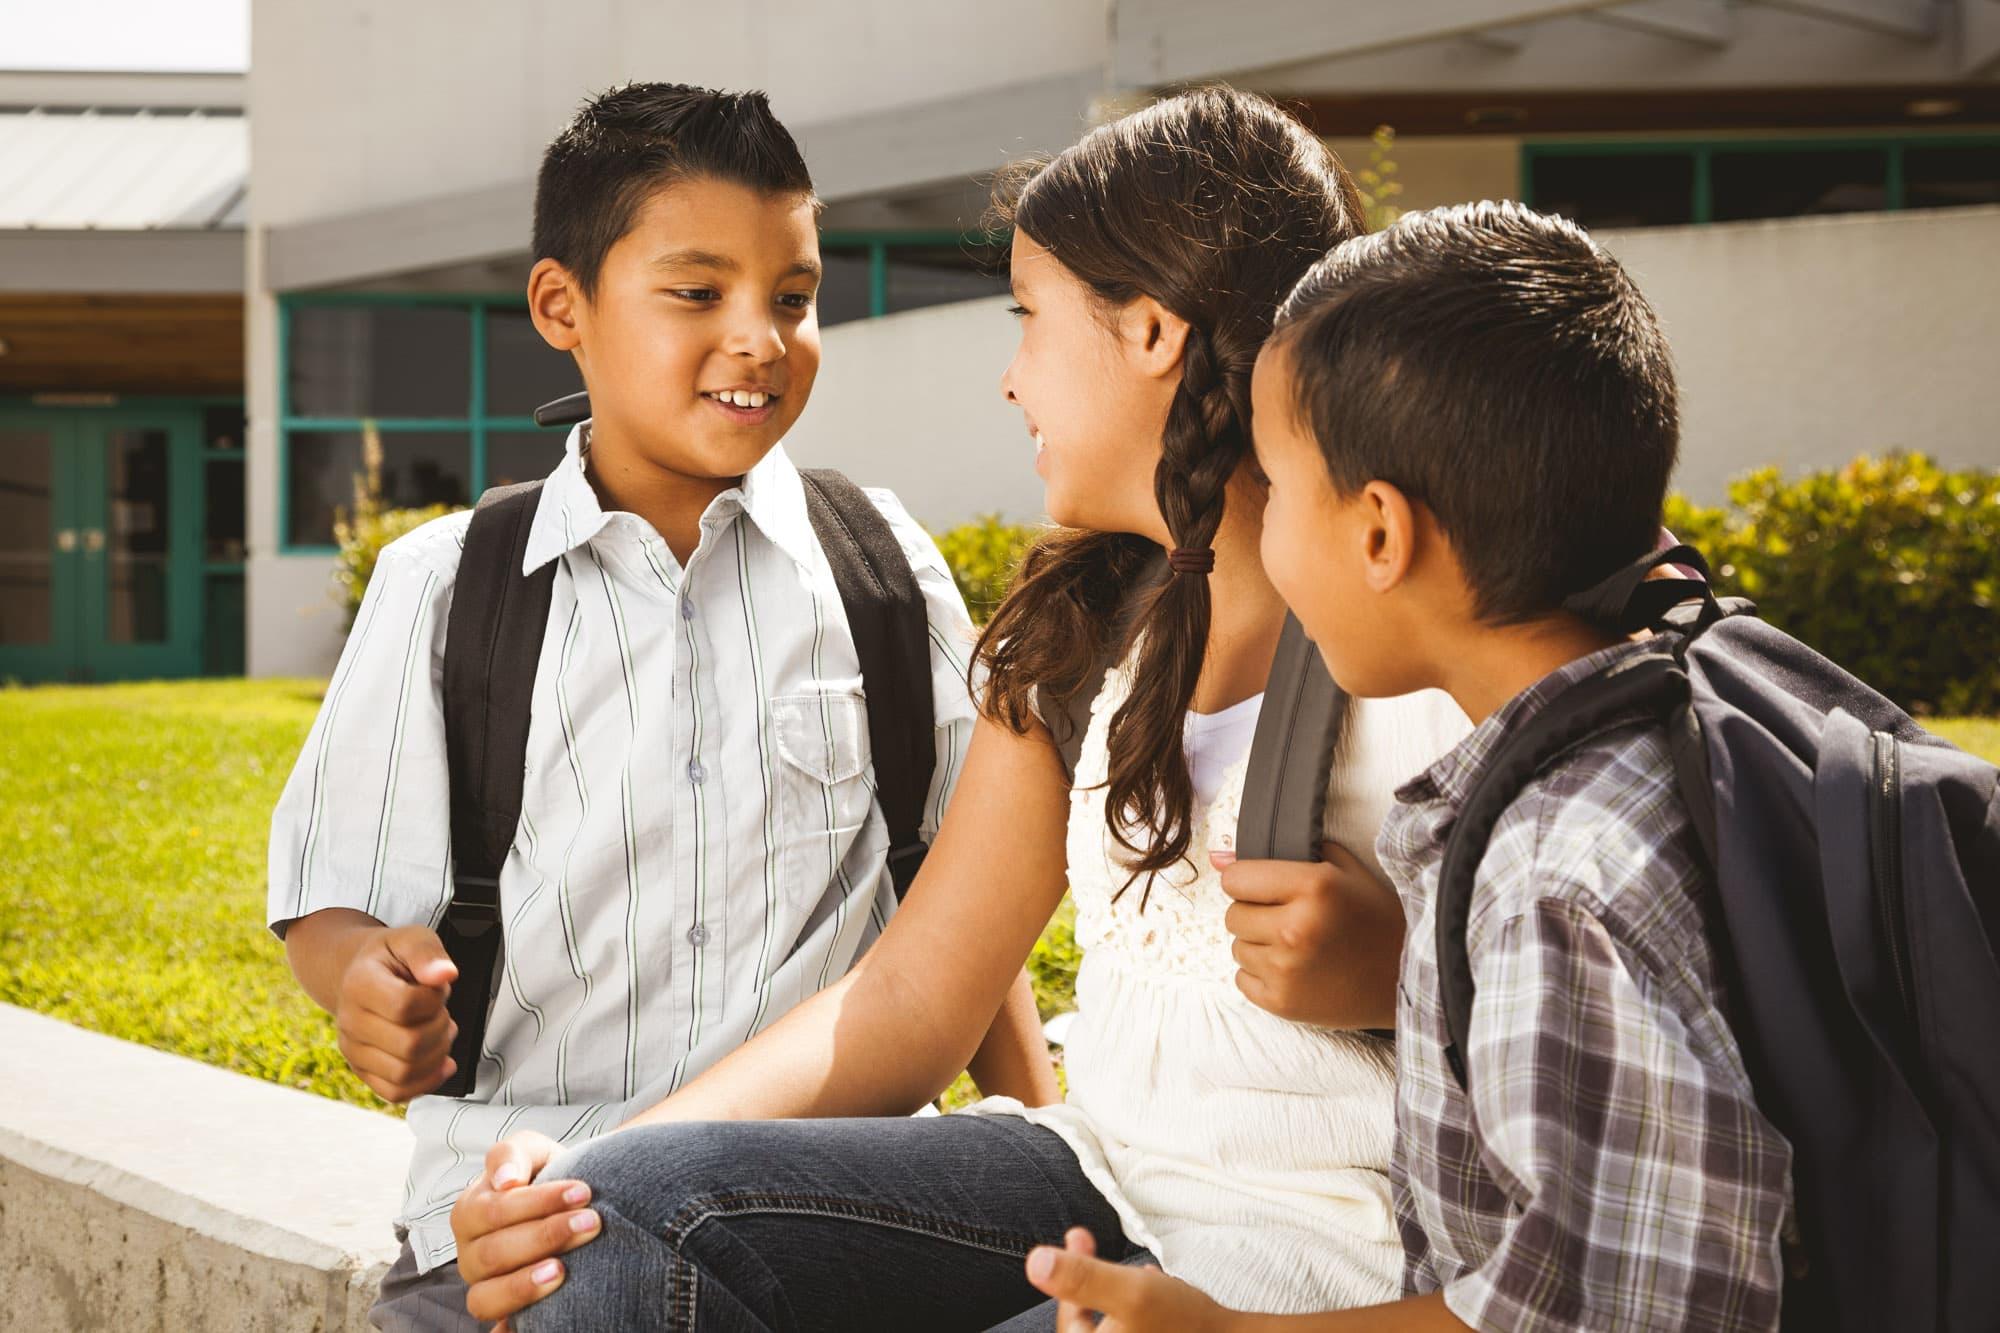 3Latinomiddleschoolkids2boys1girl